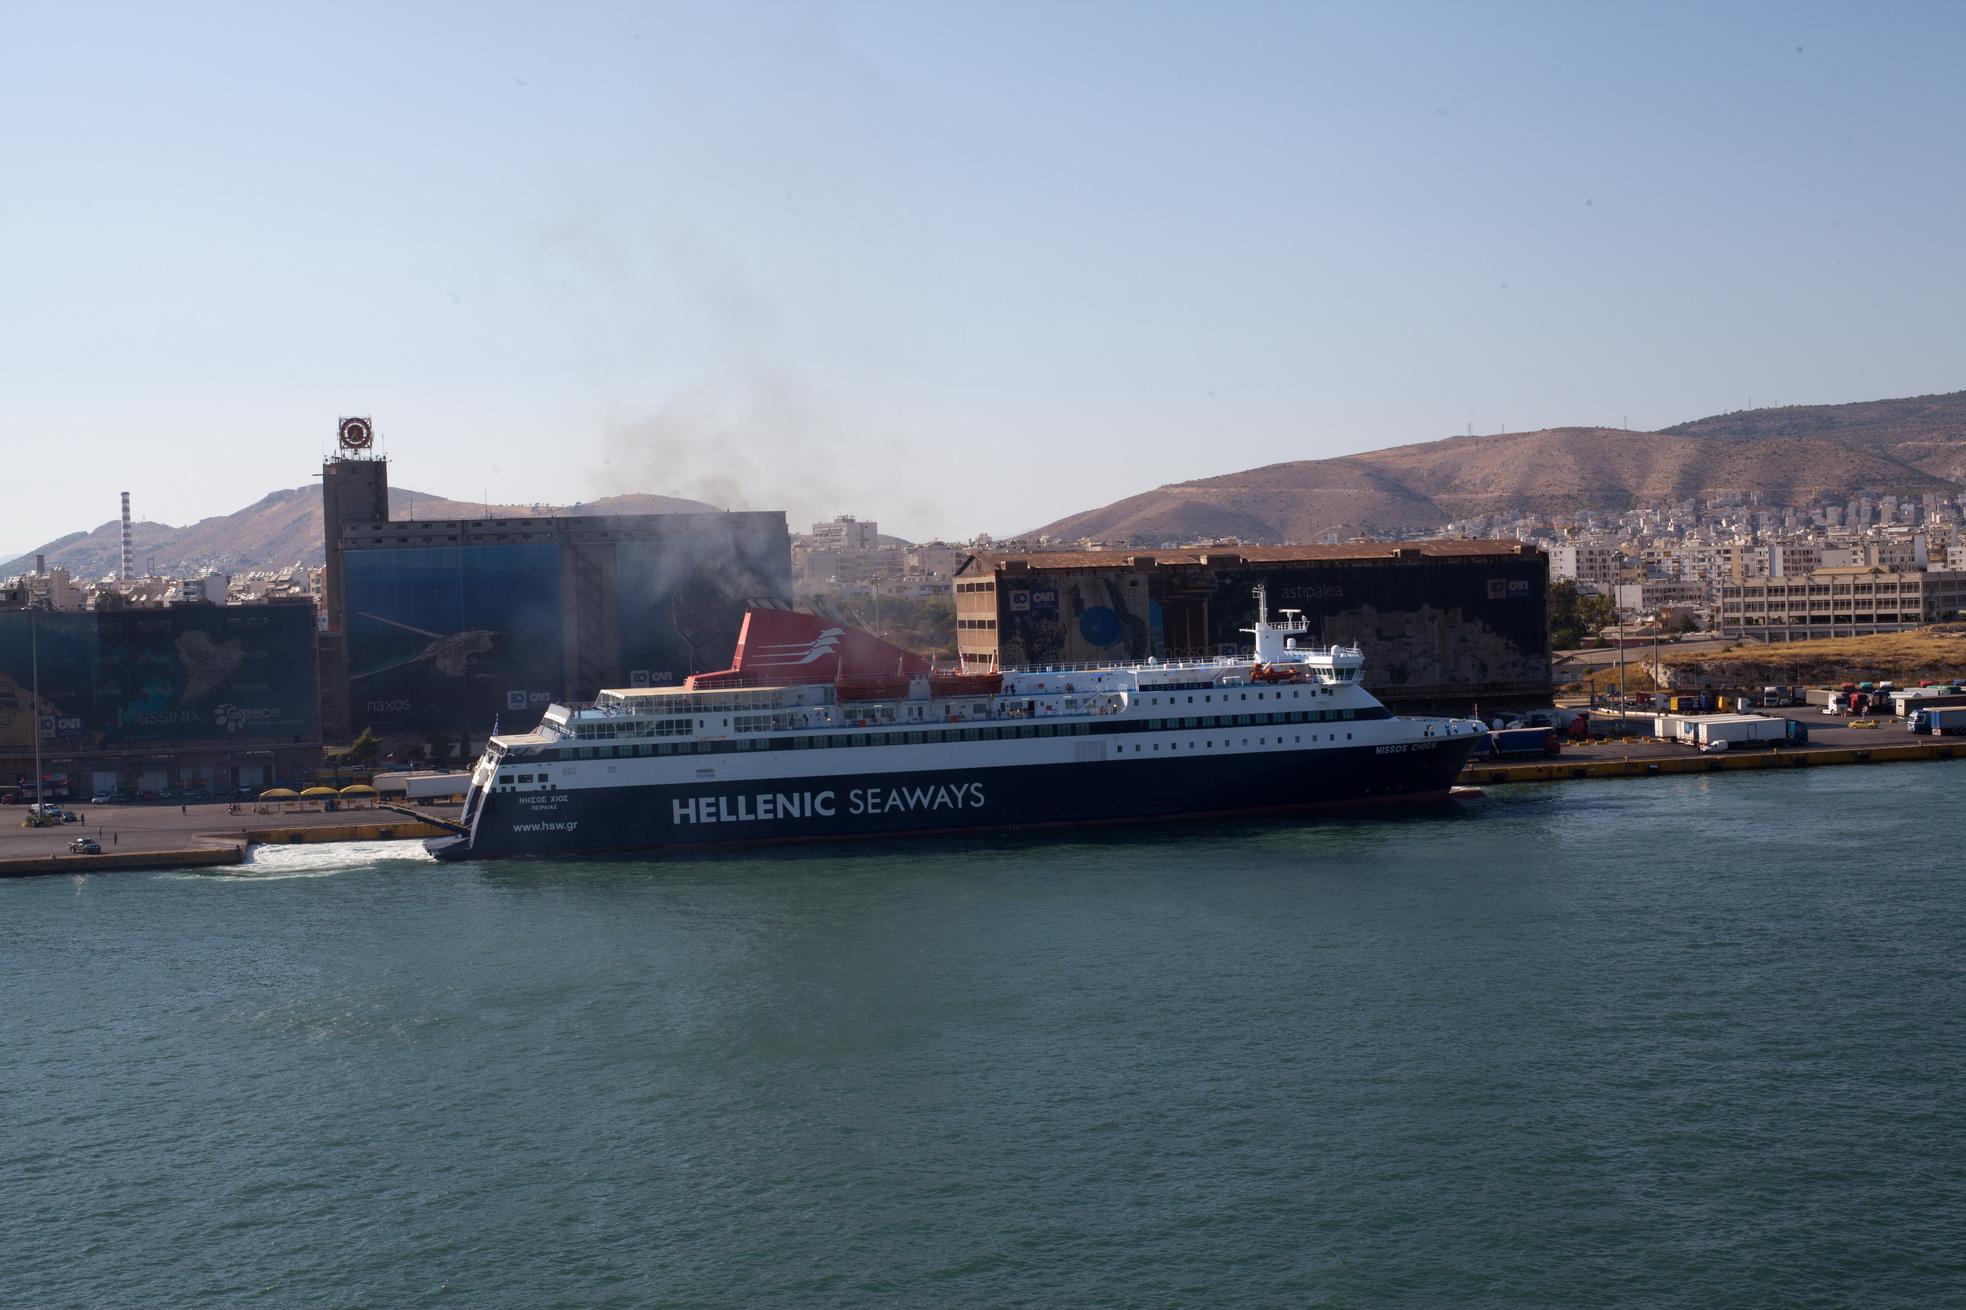 MS Nissos Chios IMO 9215555 Hellenic Seaways docking Piraeus Port of Athens Greece 02